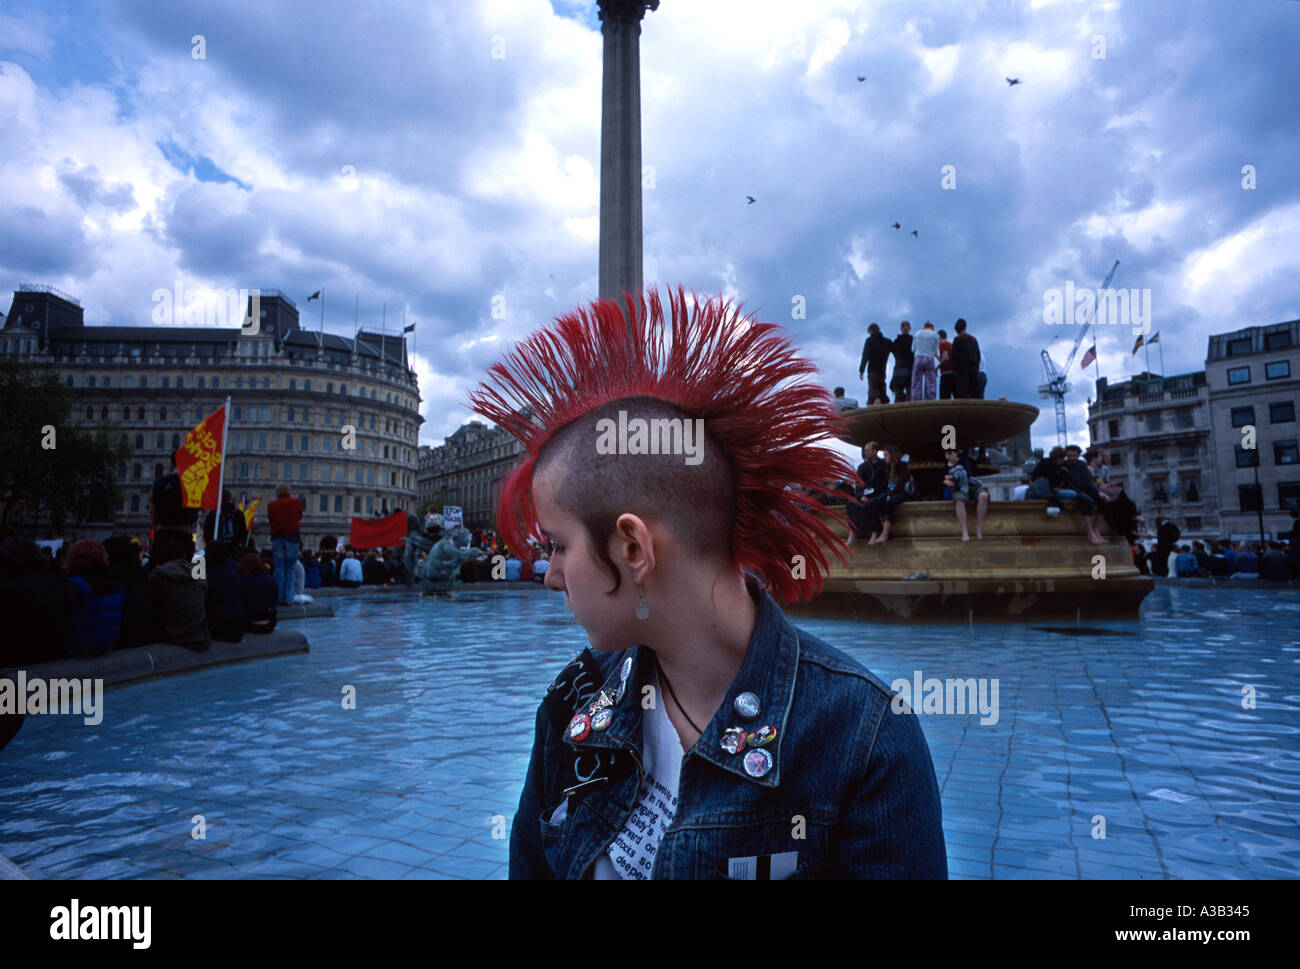 Young girl punk in Trafalgar Square London Britain England UK - Stock Image